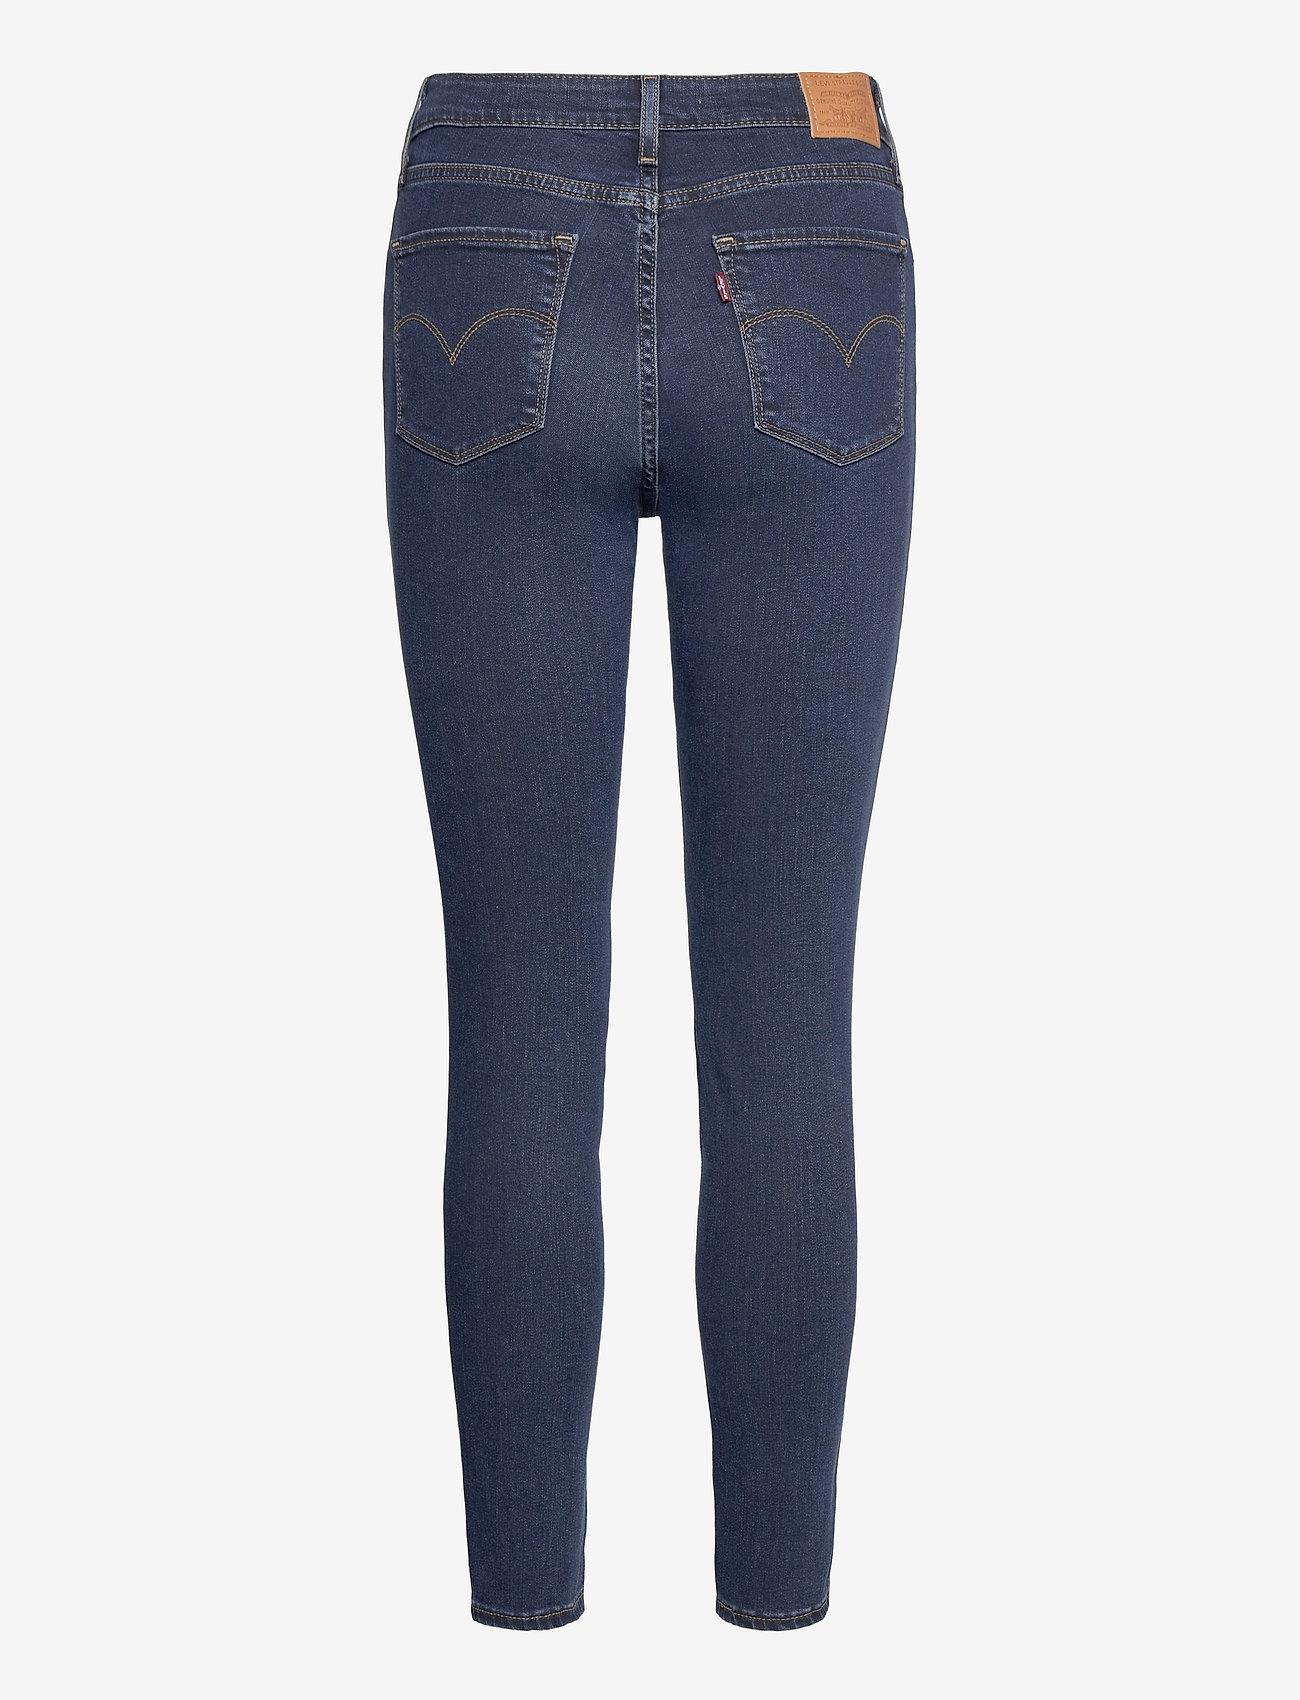 LEVI´S Women - 721 HIGH RISE SKINNY SANTIAGO - skinny jeans - dark indigo - worn in - 1